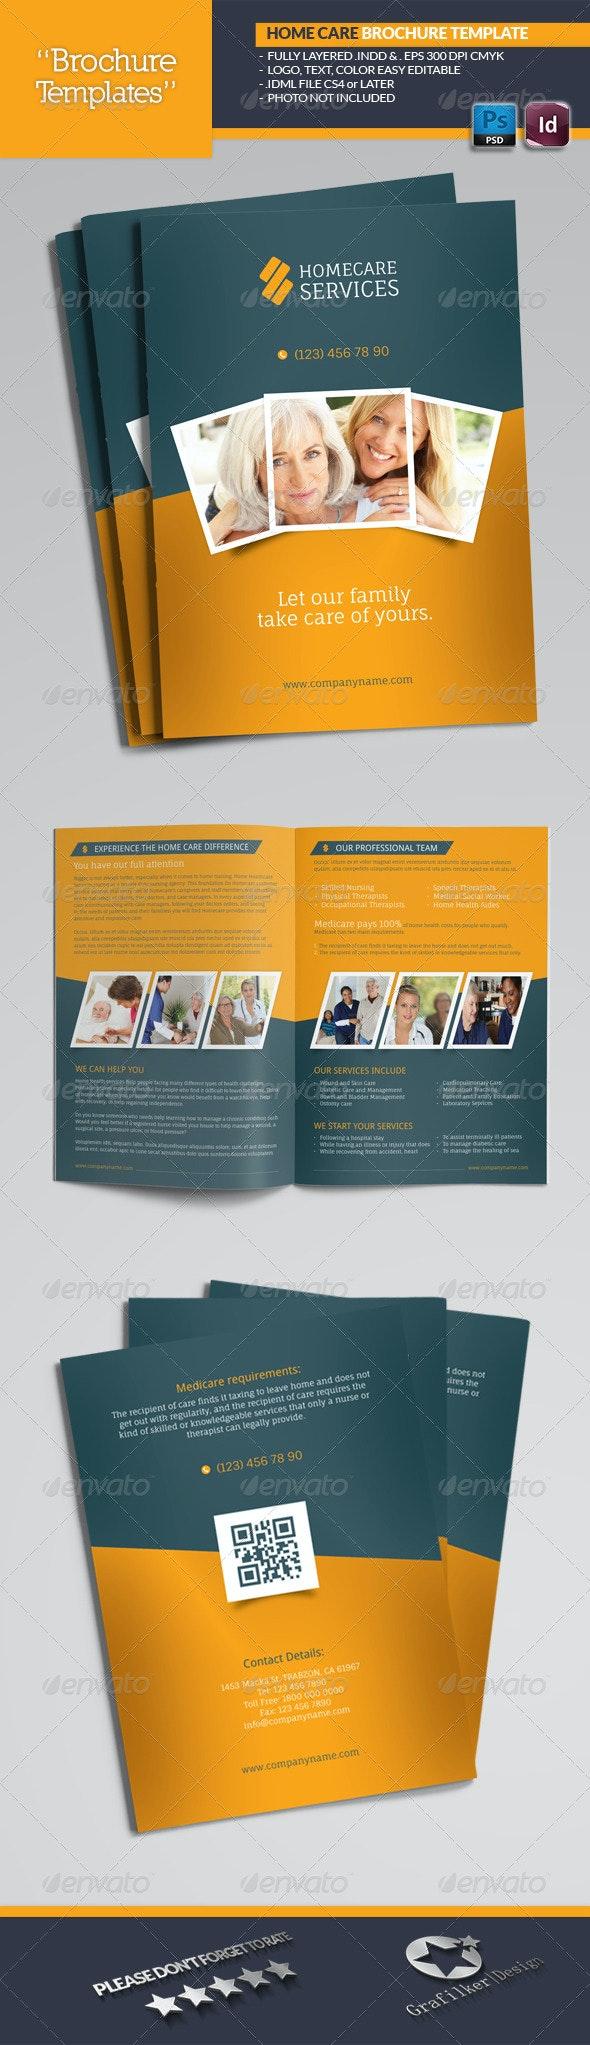 Home Care Brochure Templates - Brochures Print Templates